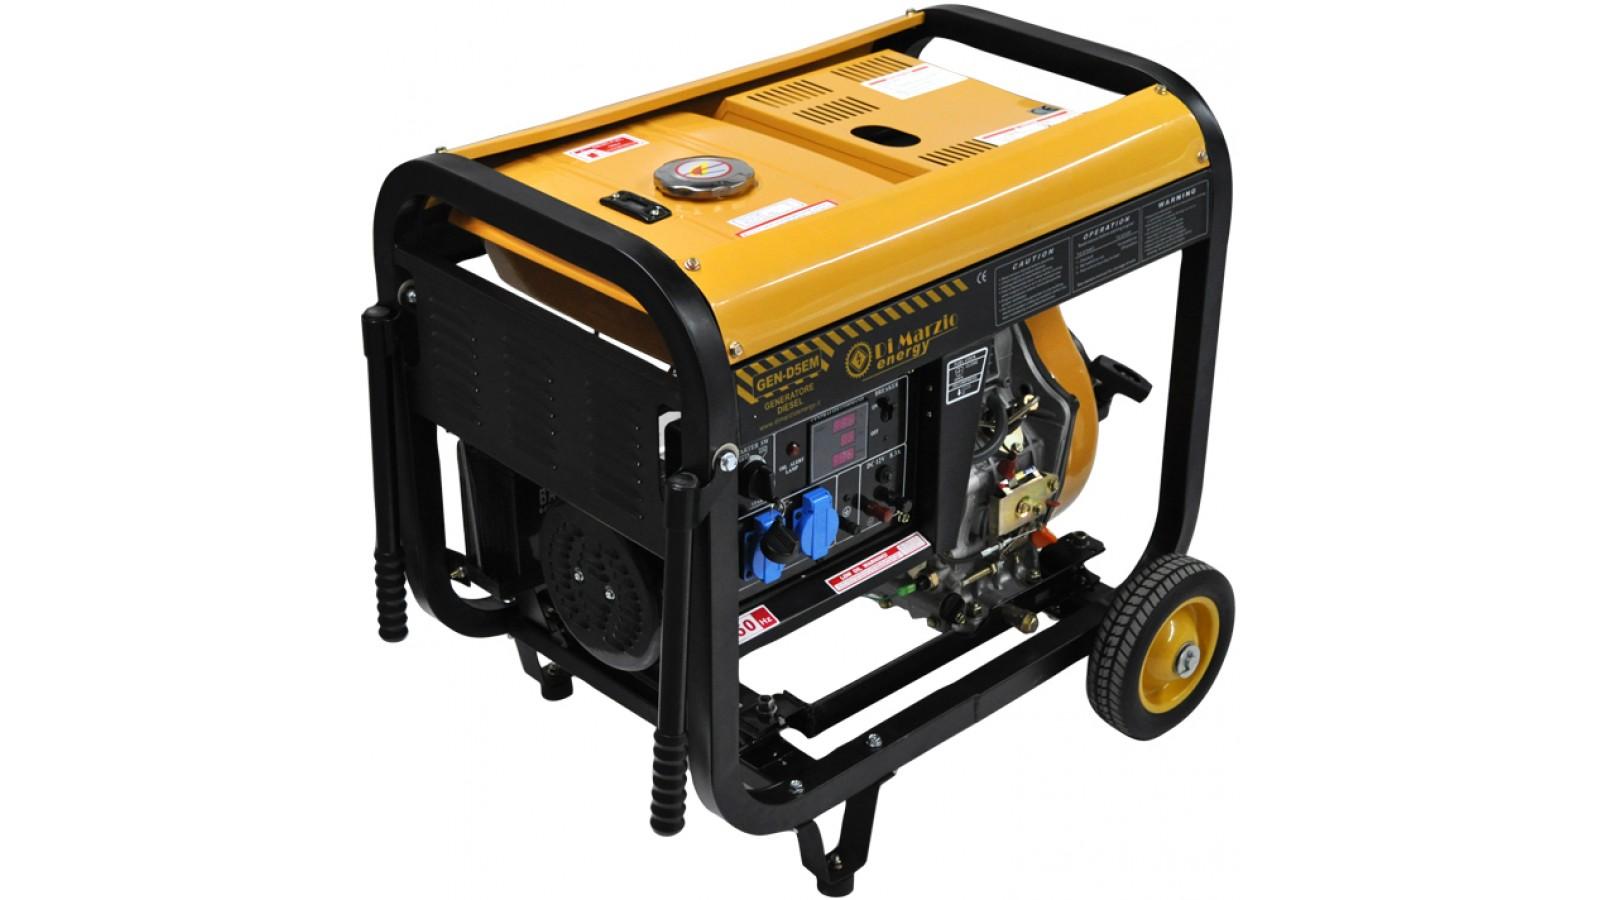 Generatore di corrente 4 5 kw diesel gruppo elettrogeno for Gruppo elettrogeno diesel 10 kw